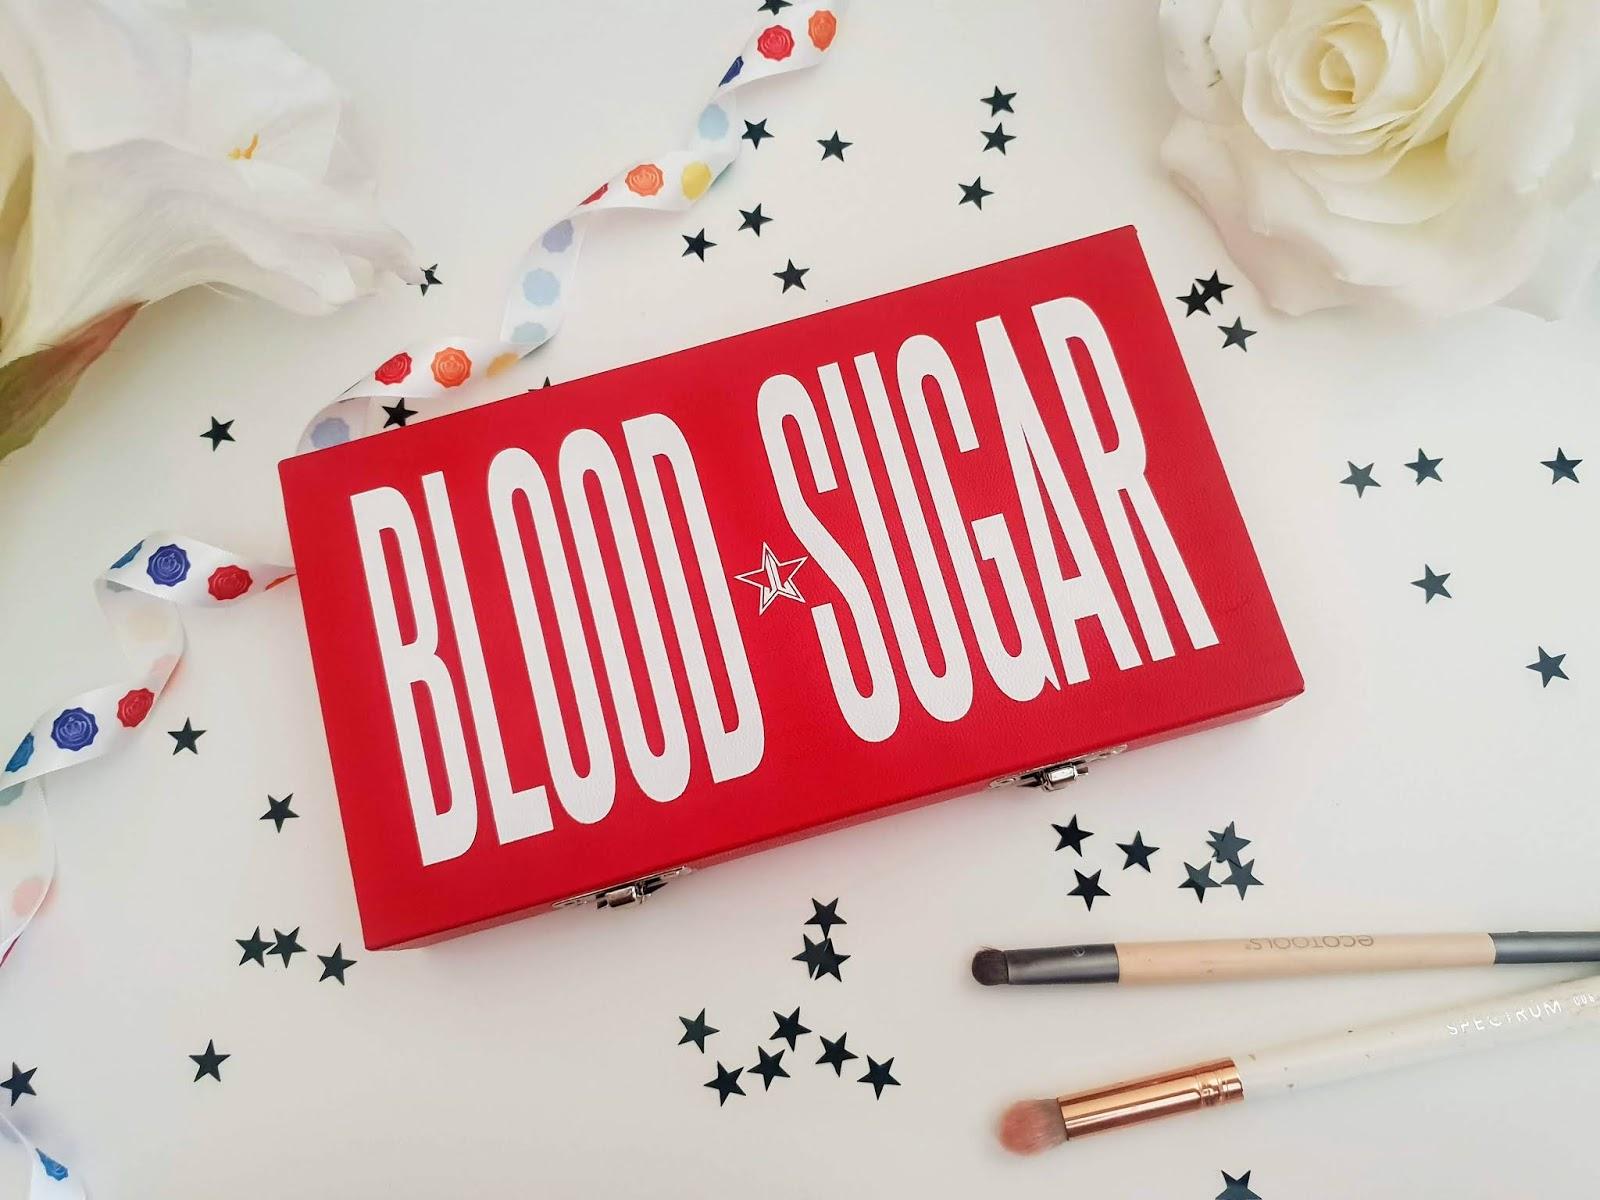 Jeffree Star Blood Sugar Eyeshadow Palette review